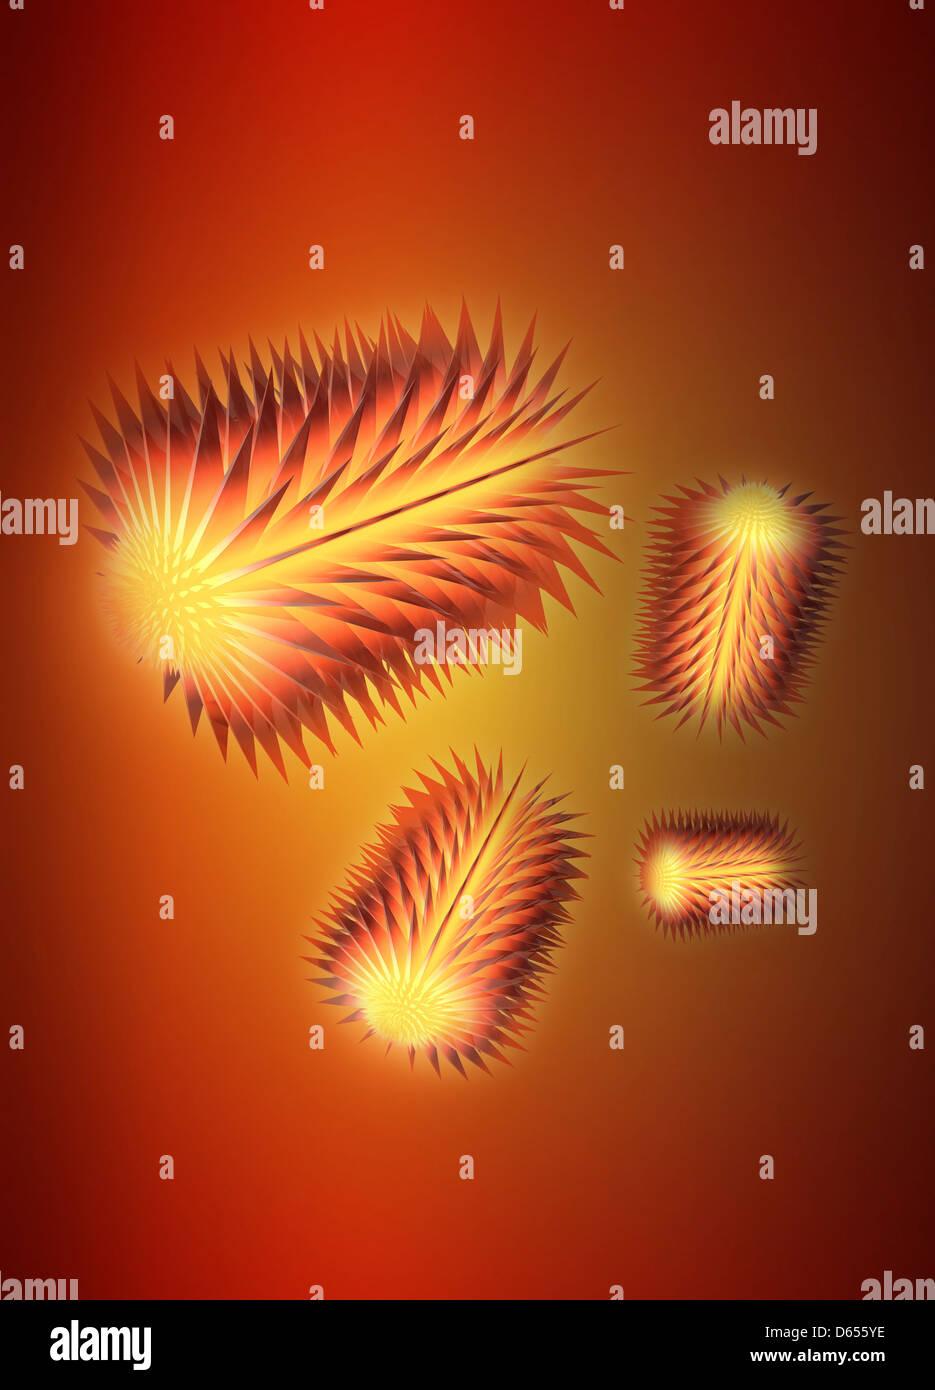 Virus particles, conceptual artwork - Stock Image